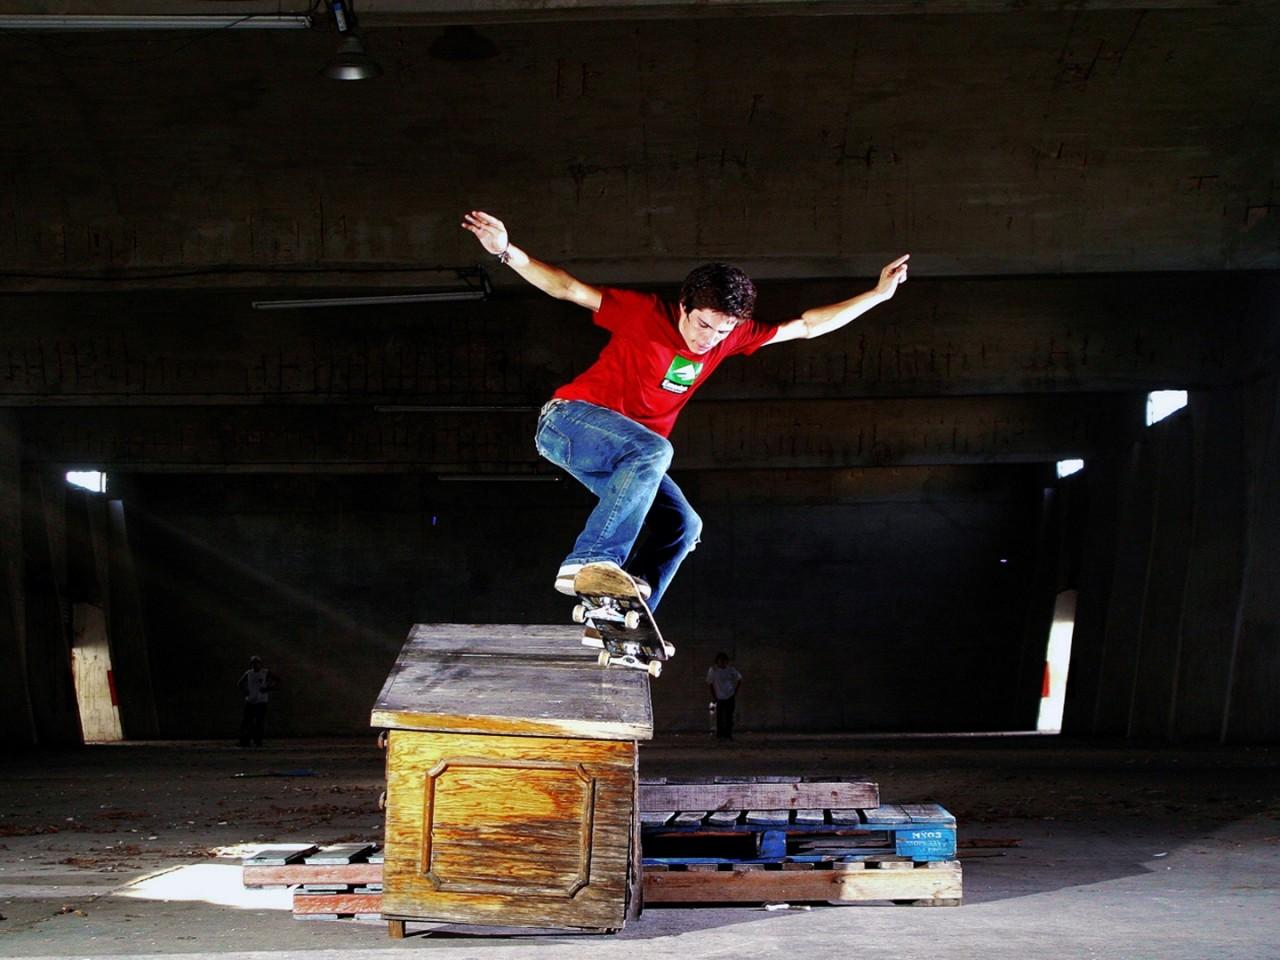 Skateboard Iphone Wallpaper: Skateboard Grind Wallpaper